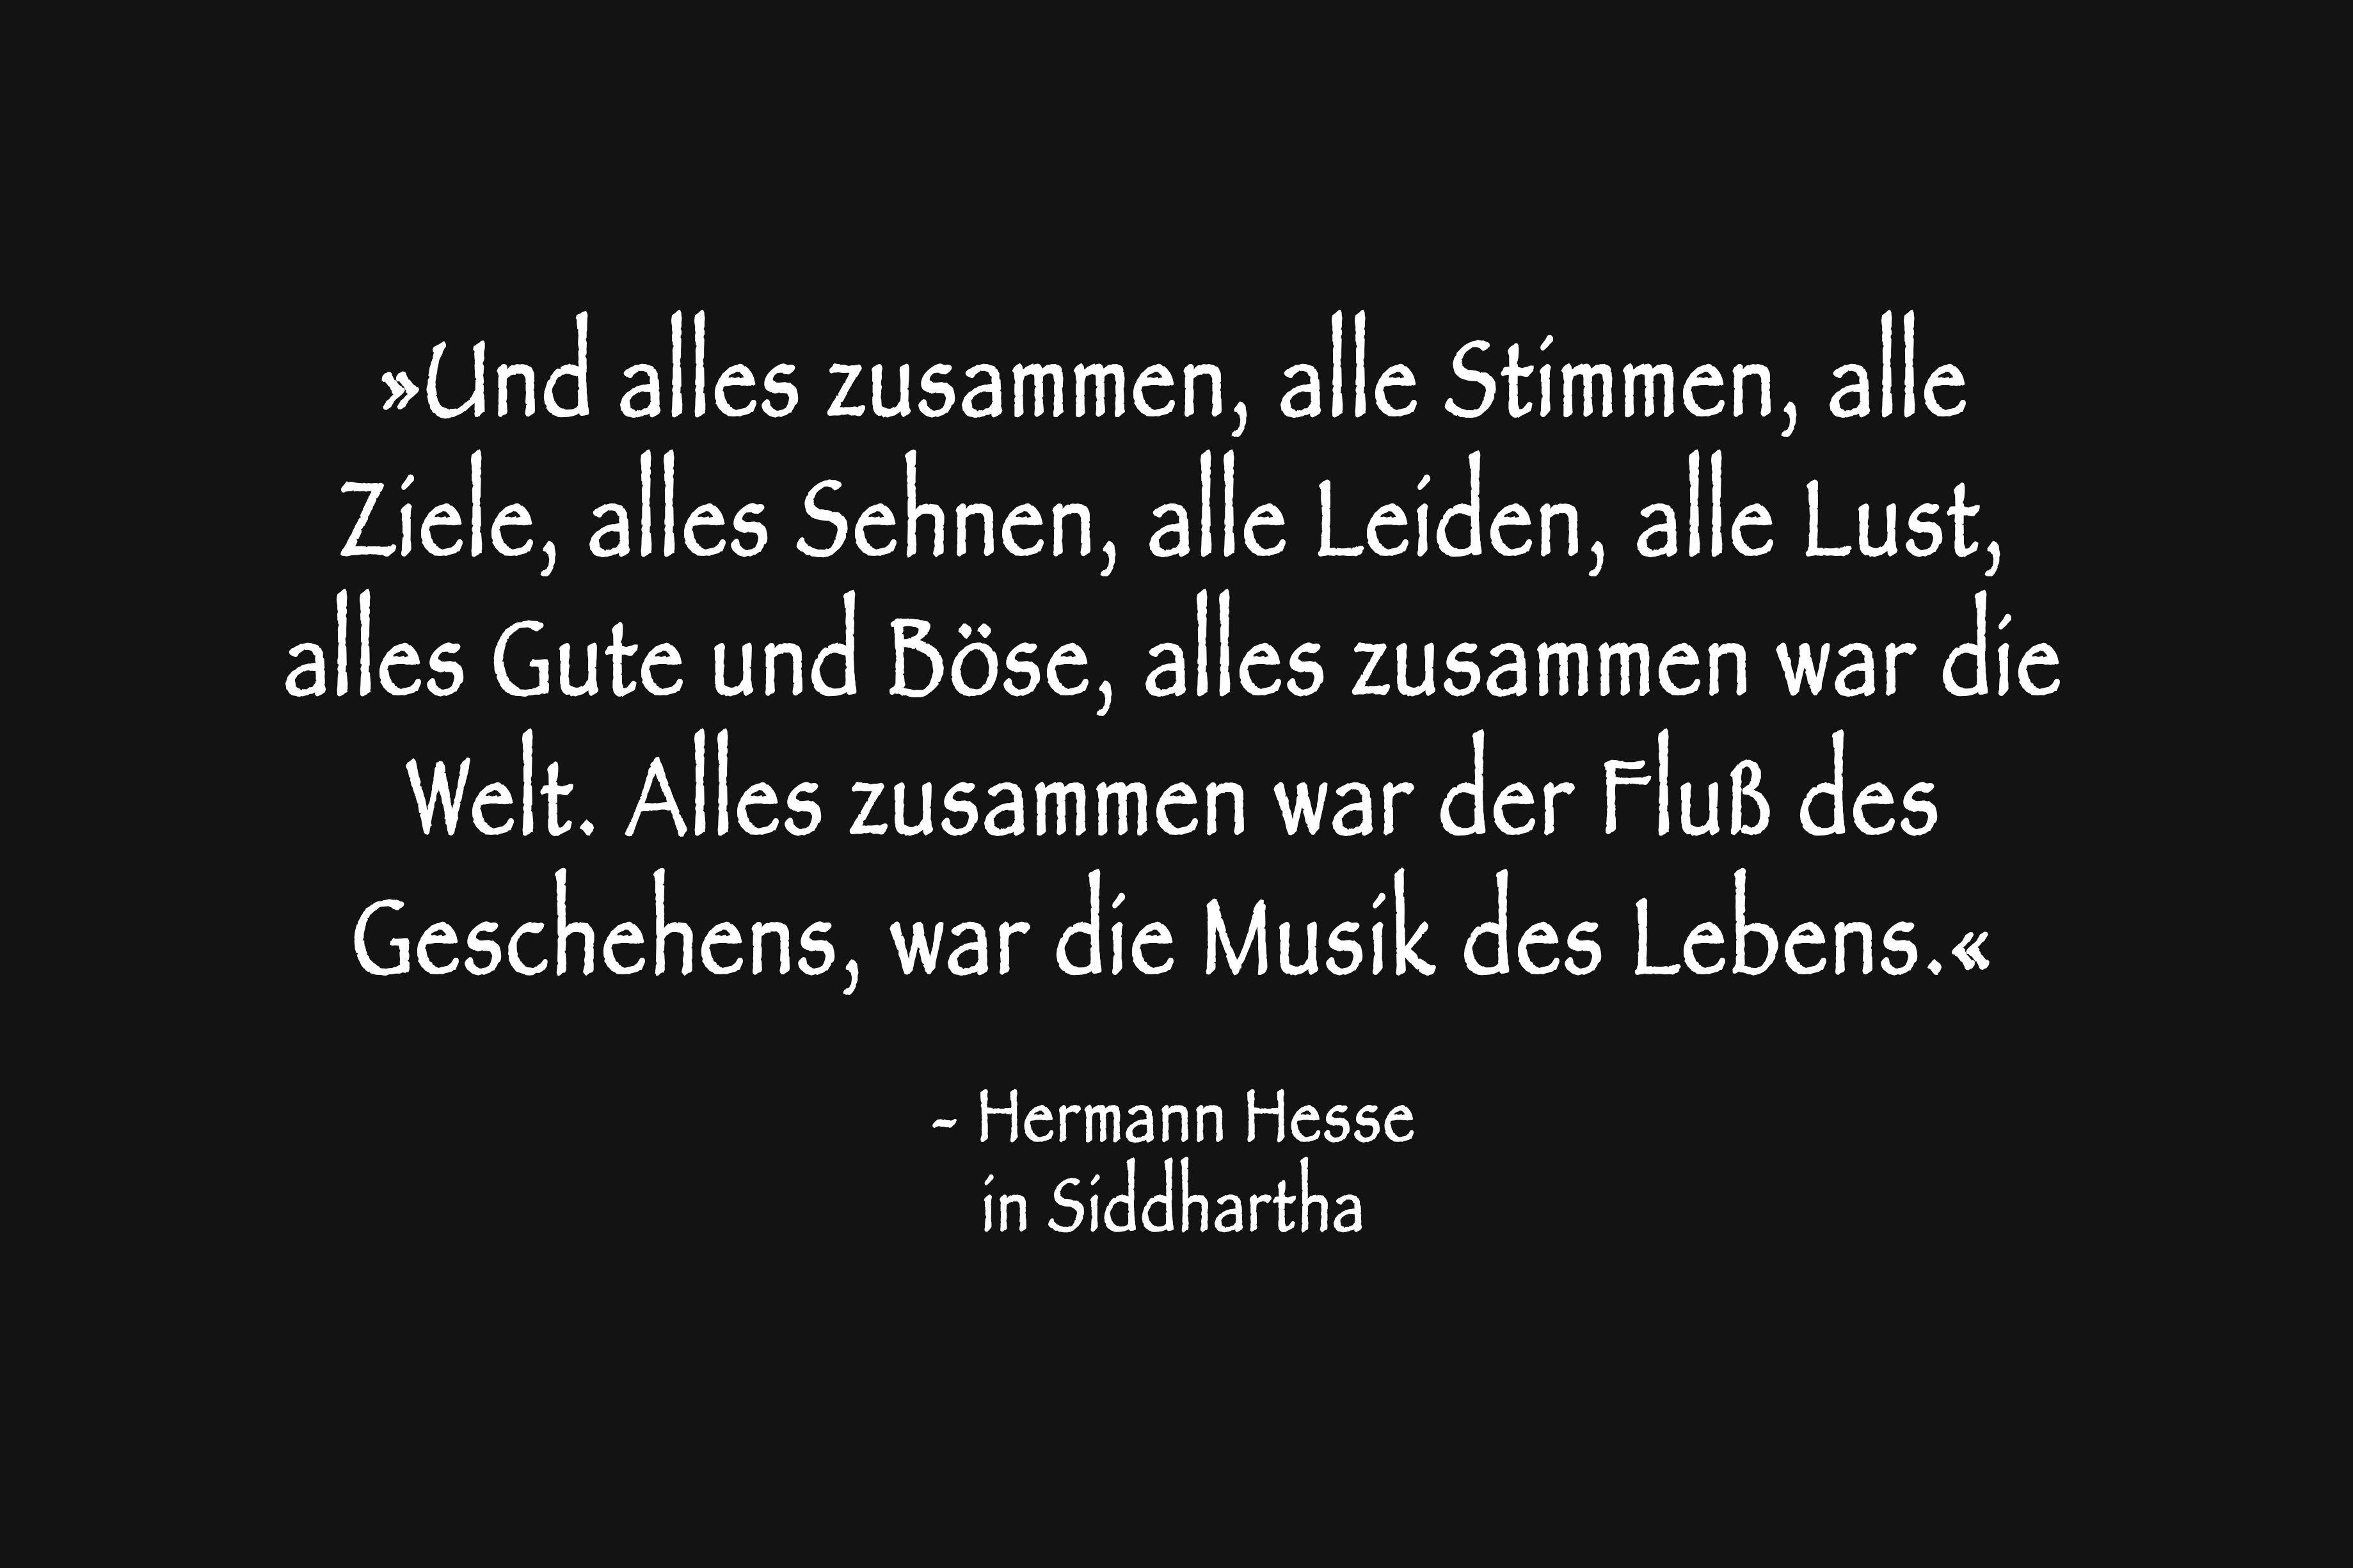 Zitate Zum Geburtstag Hermann Hesse